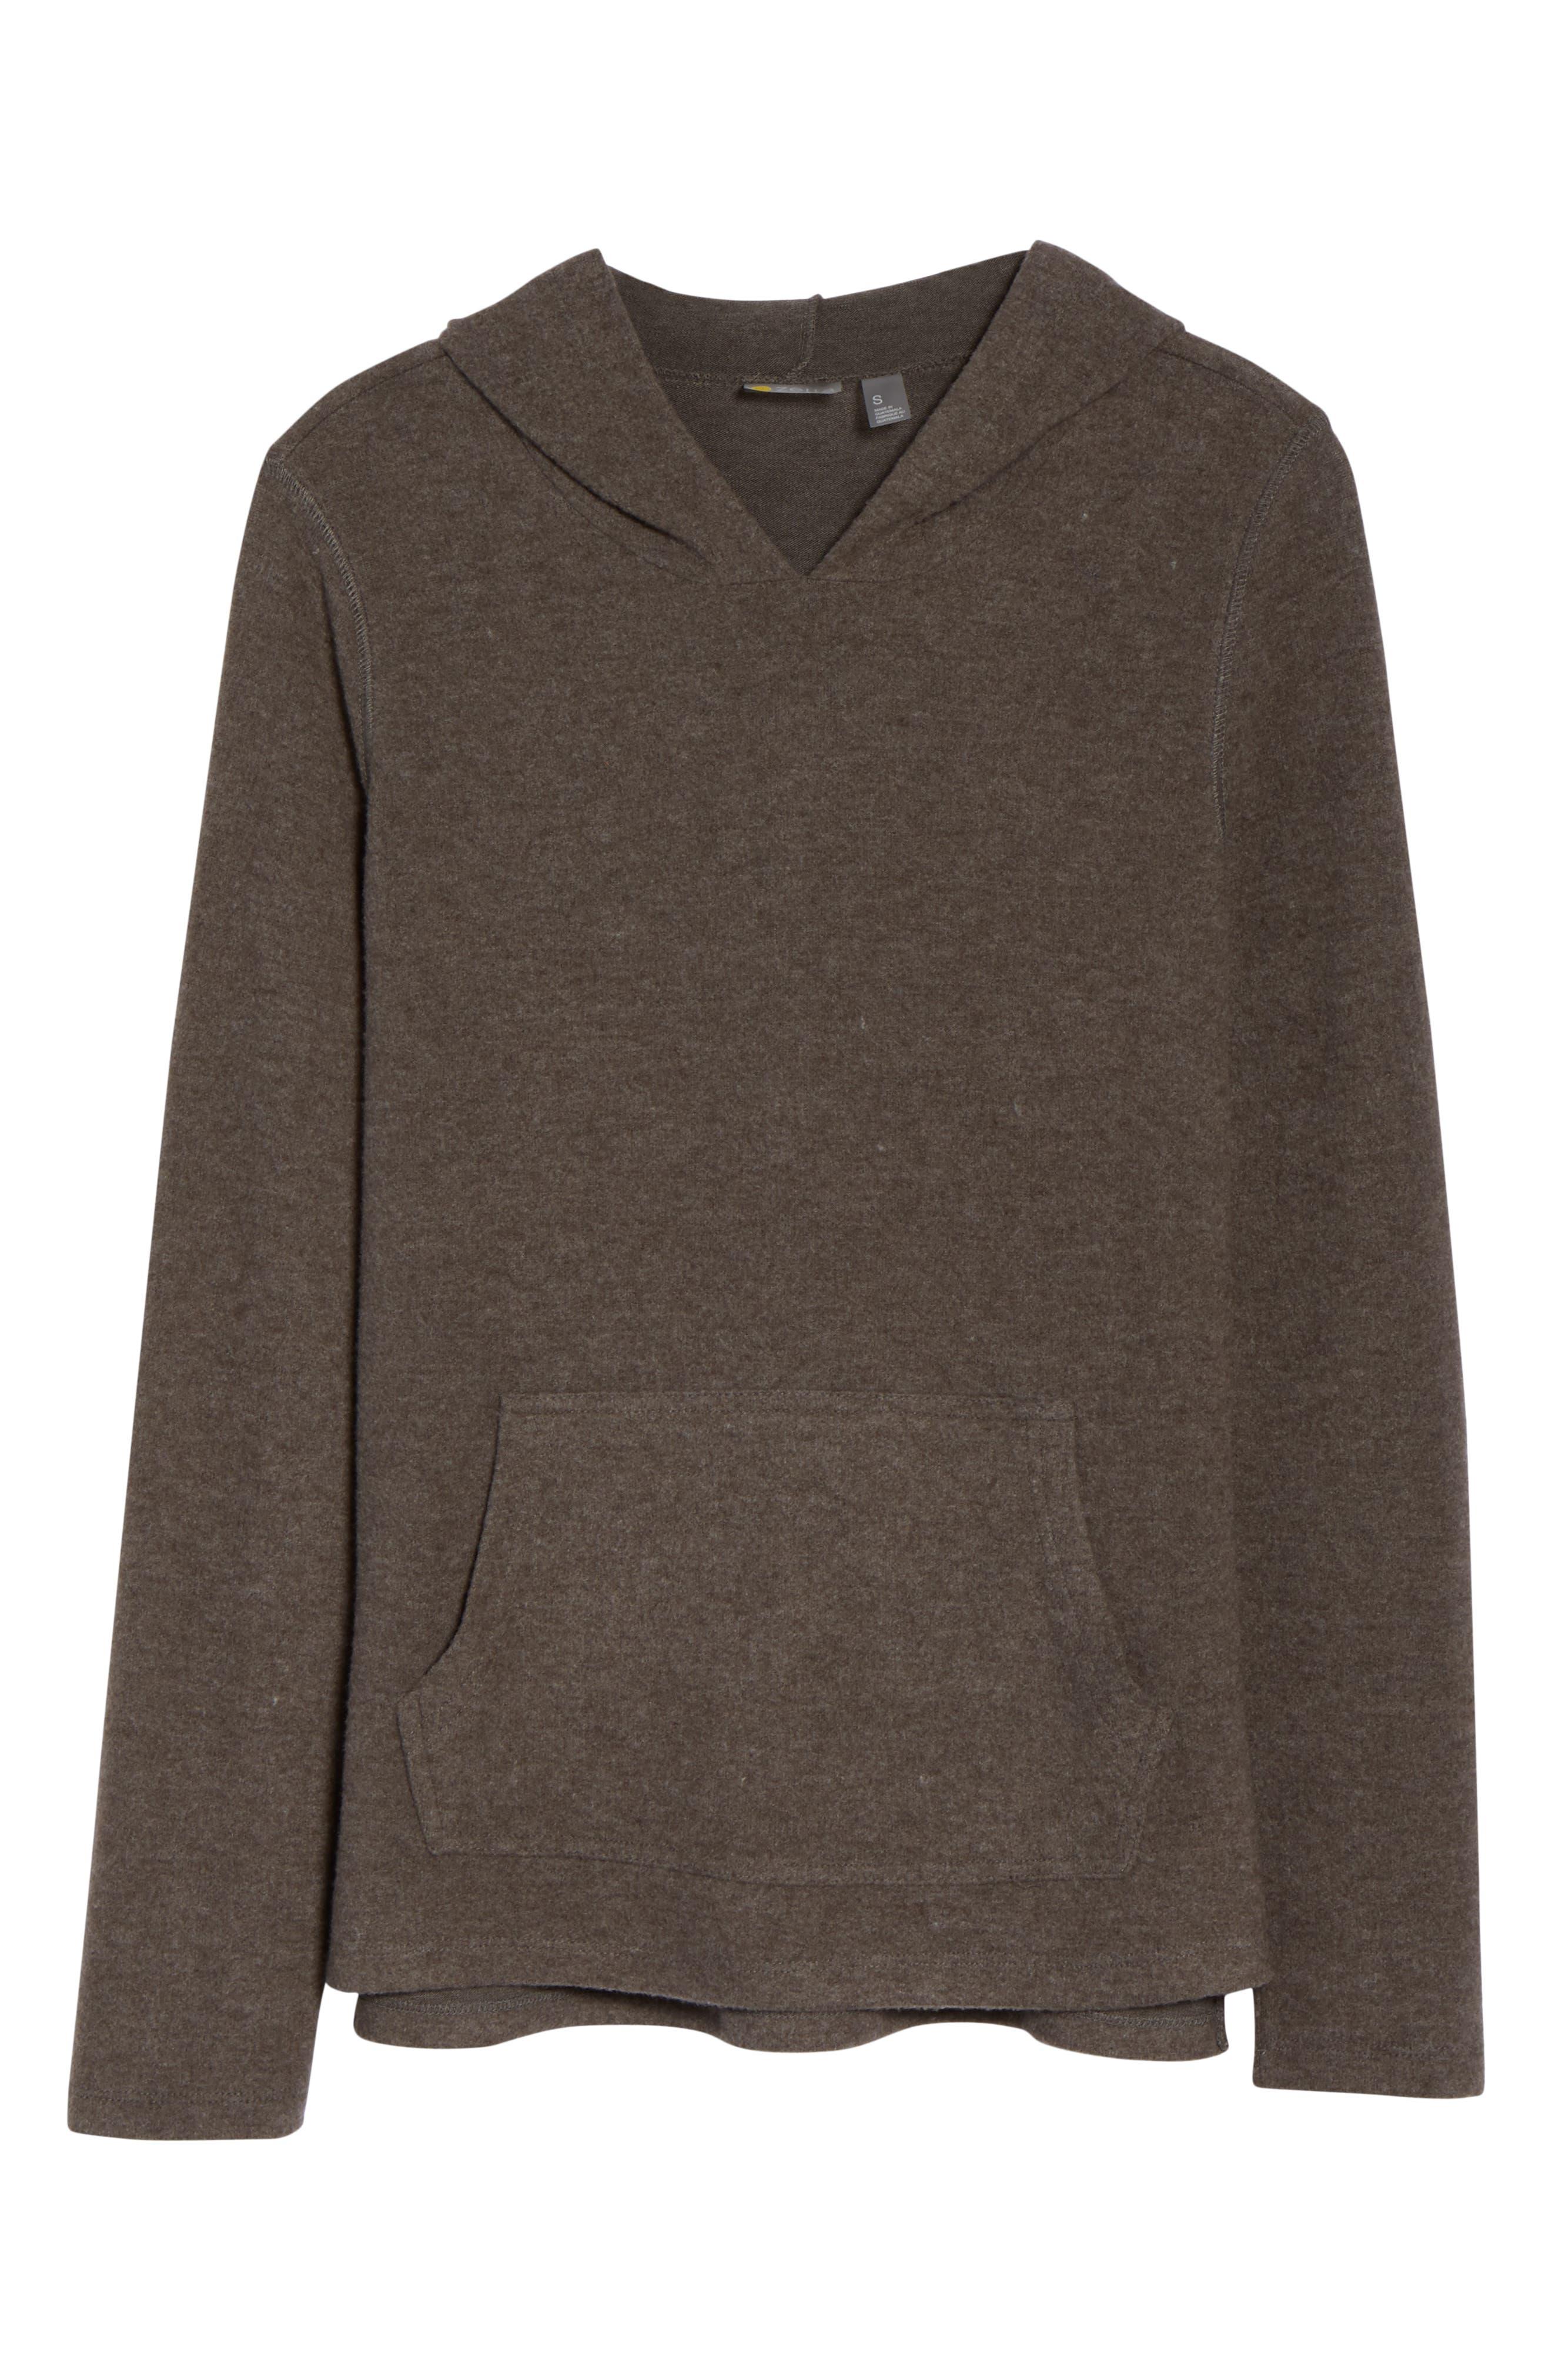 ZELLA,                             Cozy Hoodie Sweatshirt,                             Alternate thumbnail 7, color,                             021